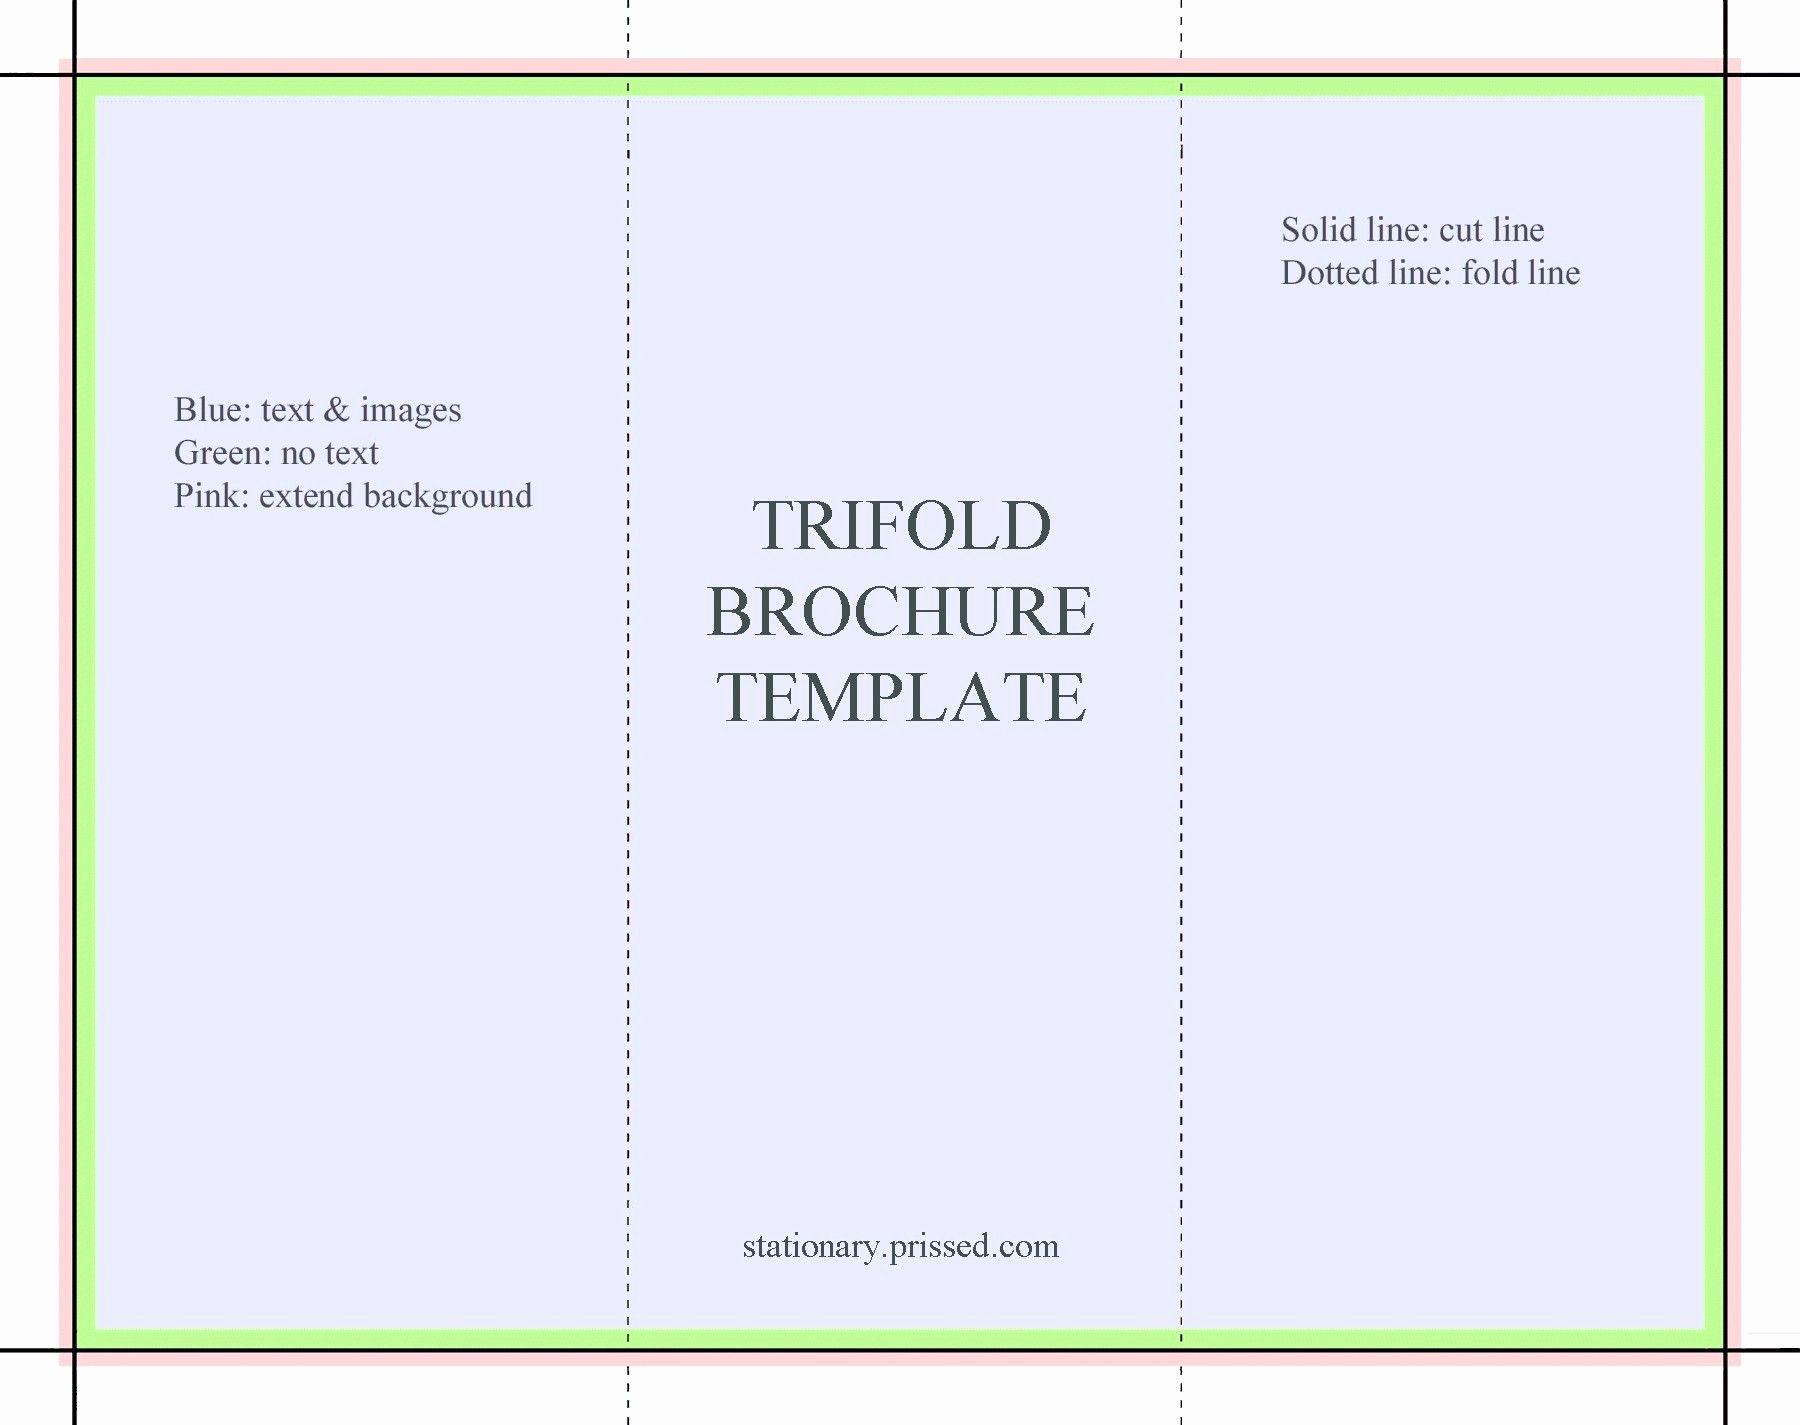 The Mesmerizing Flyer Template Google Docs Inside 6 Panel Brochure Template Digital P Free Brochure Template Travel Brochure Template Trifold Brochure Template